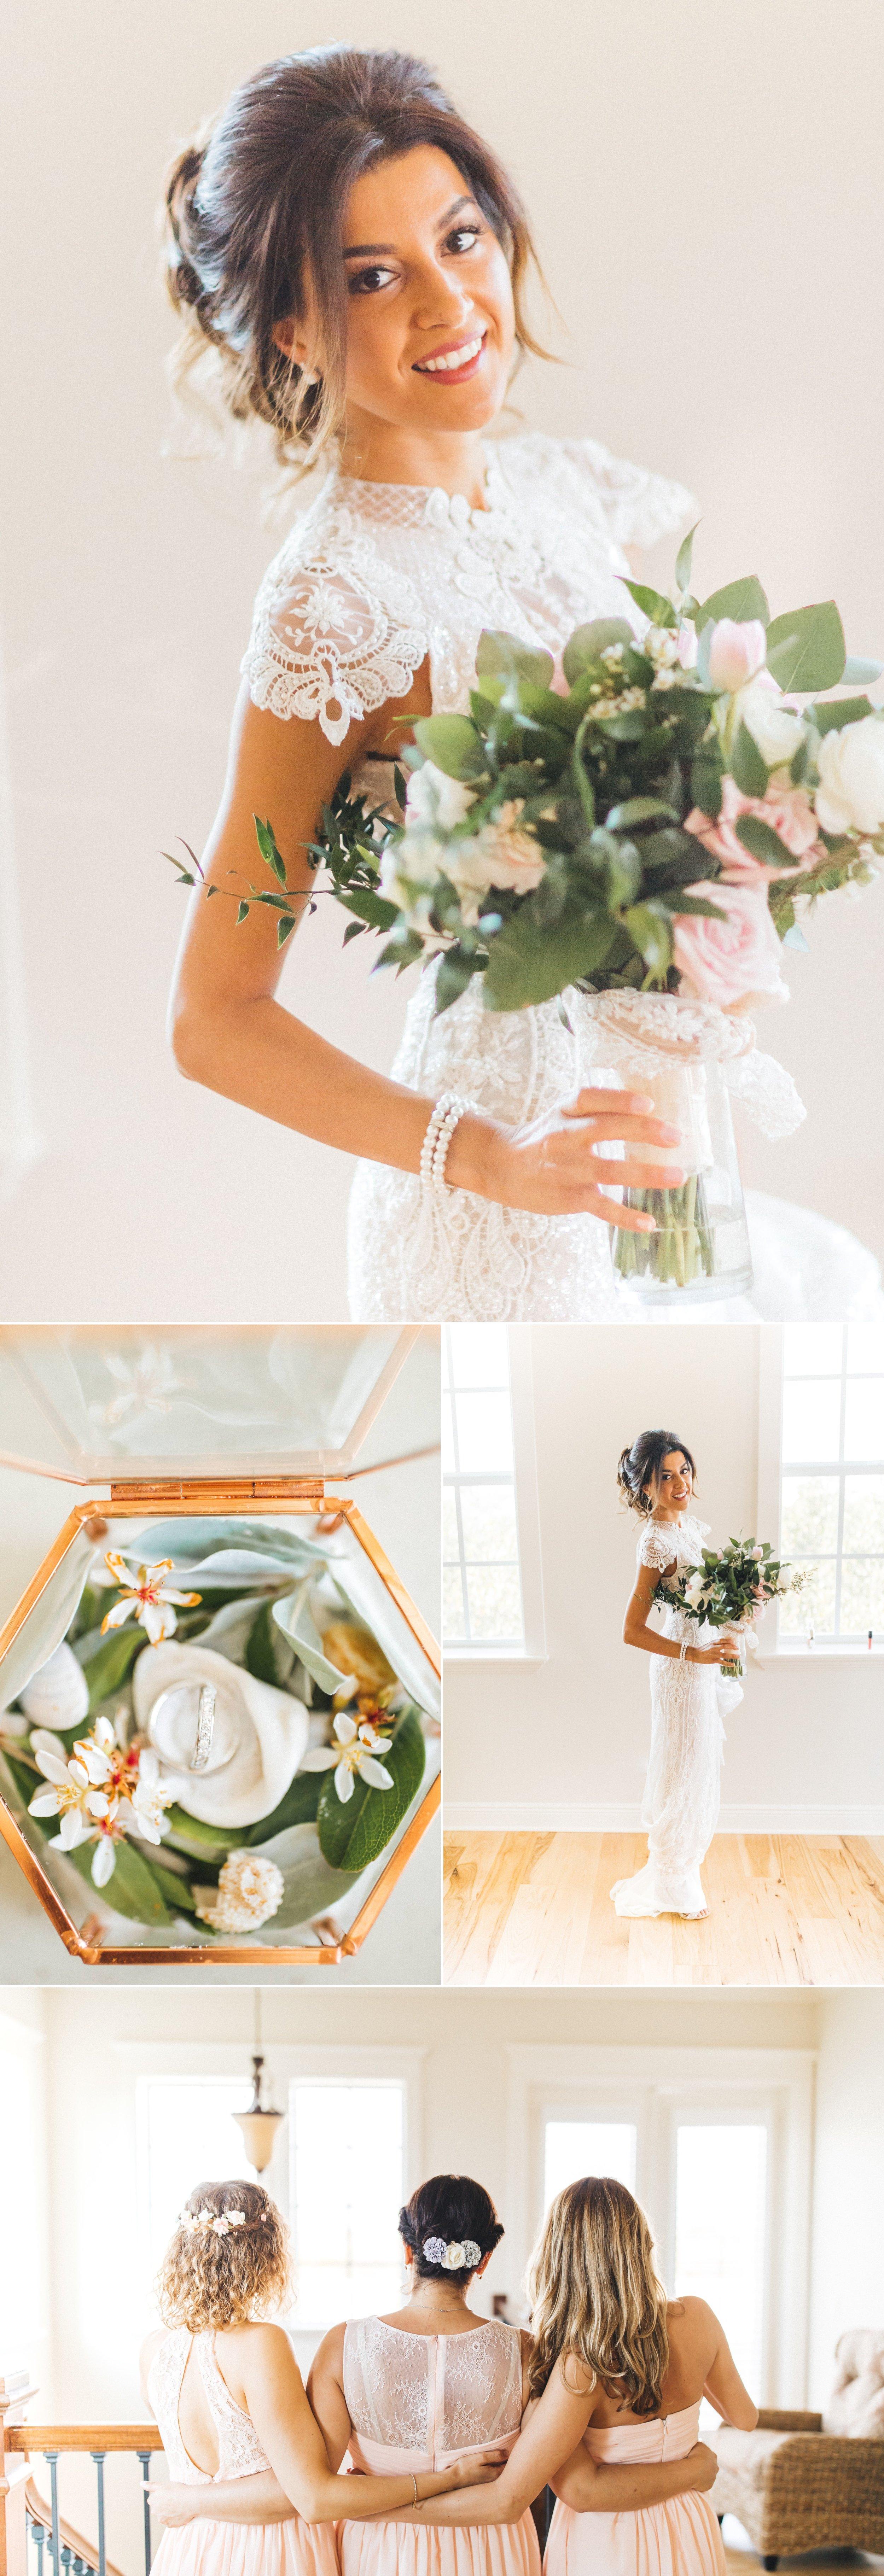 Captiva Island Destination Elopement Wedding Photography-blog- Zohra+David-by-Shaina-DeCiryan9.jpg